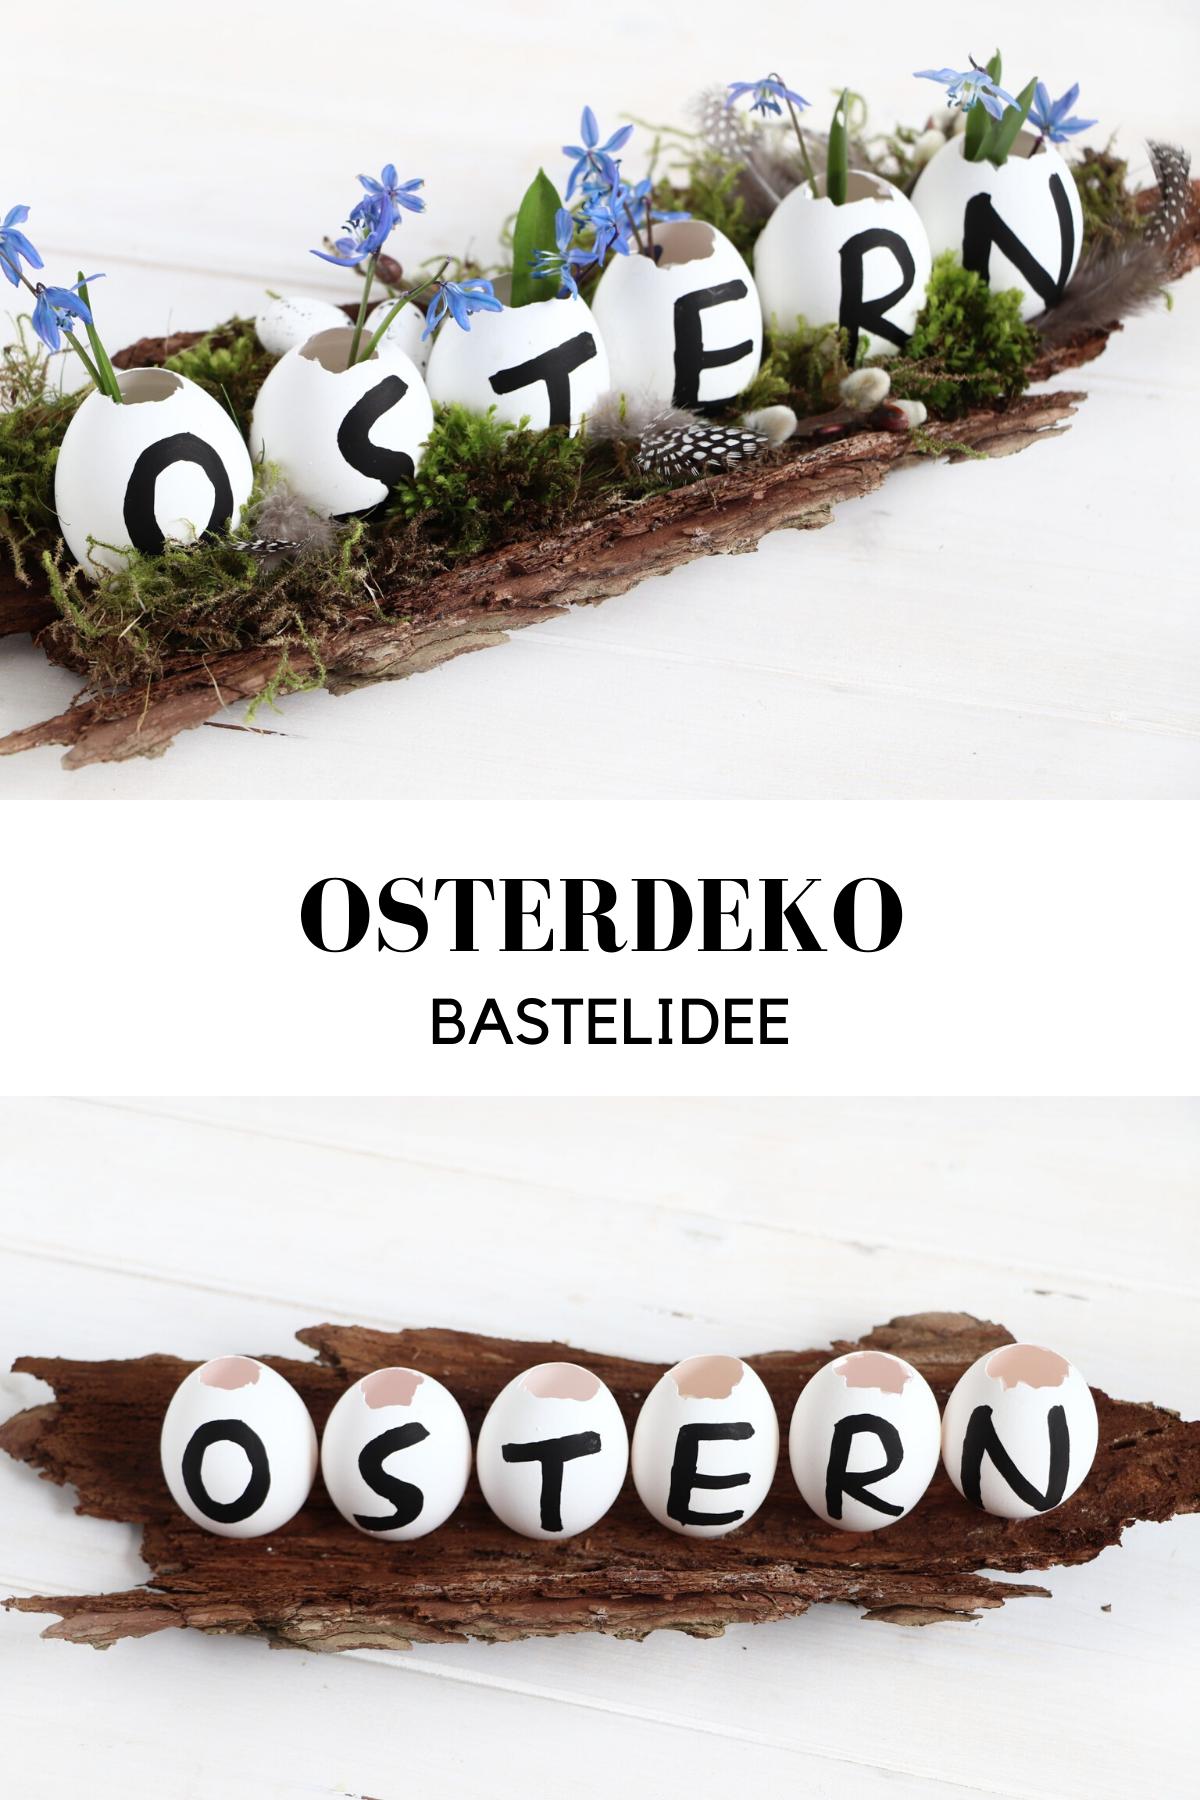 Osterdeko basteln: Tischgesteck